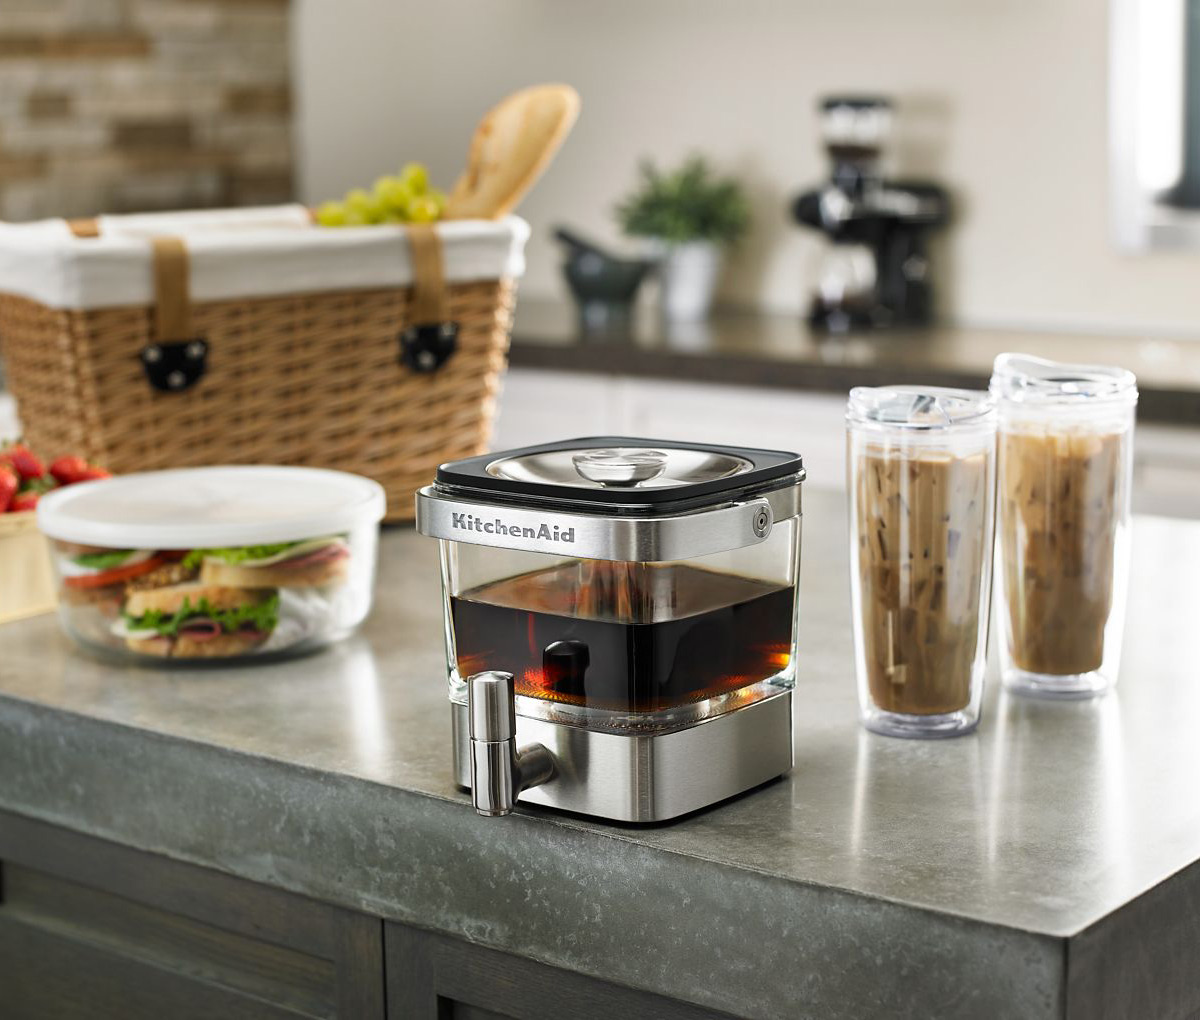 Coffee Maker Funny Taste : KitchenAid Cold Brew Coffee Maker - The Green Head